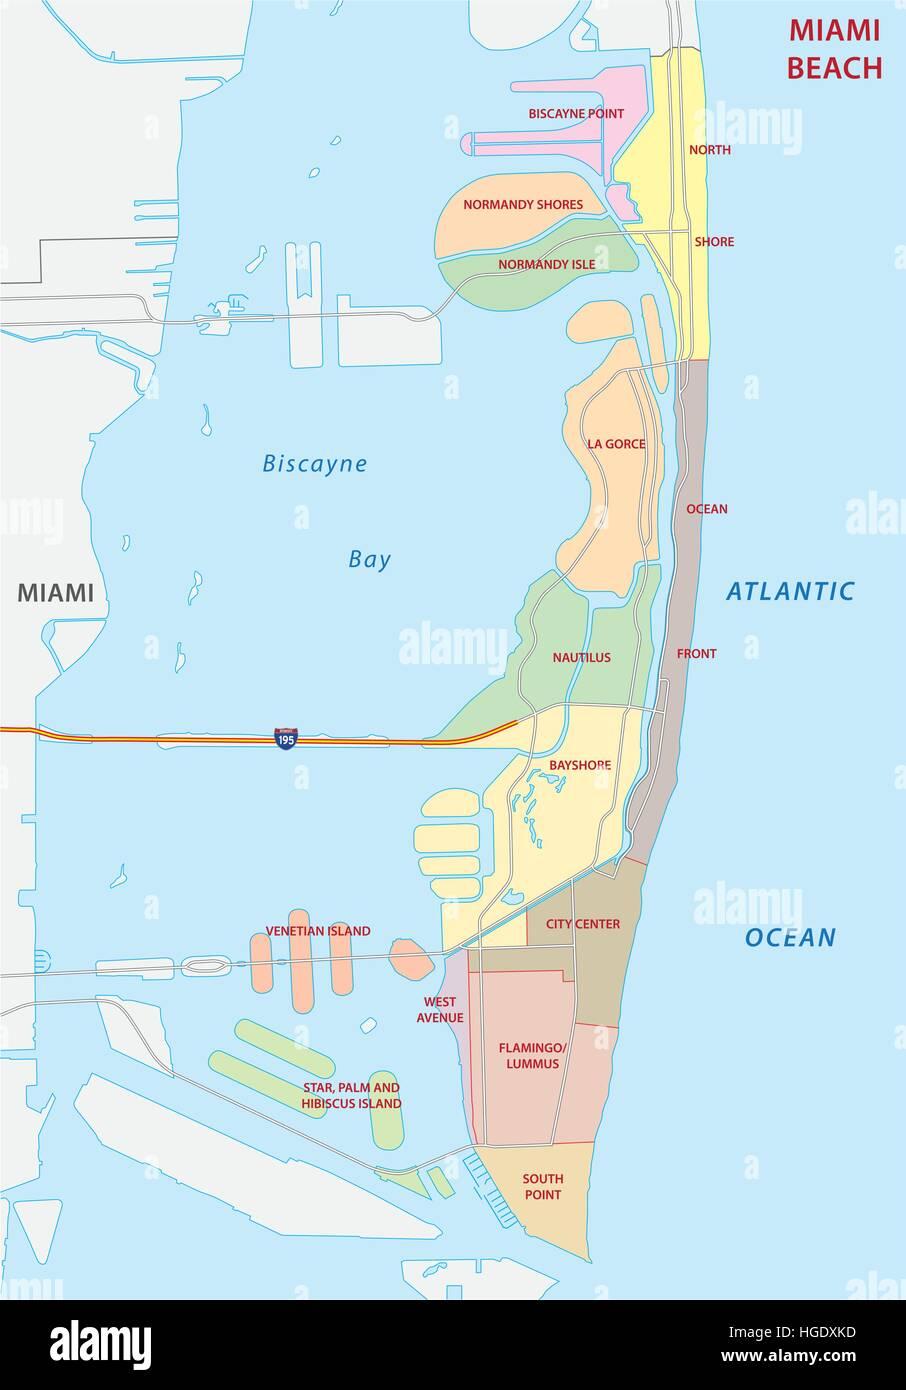 miami beach administrative map Stock Vector Art Illustration